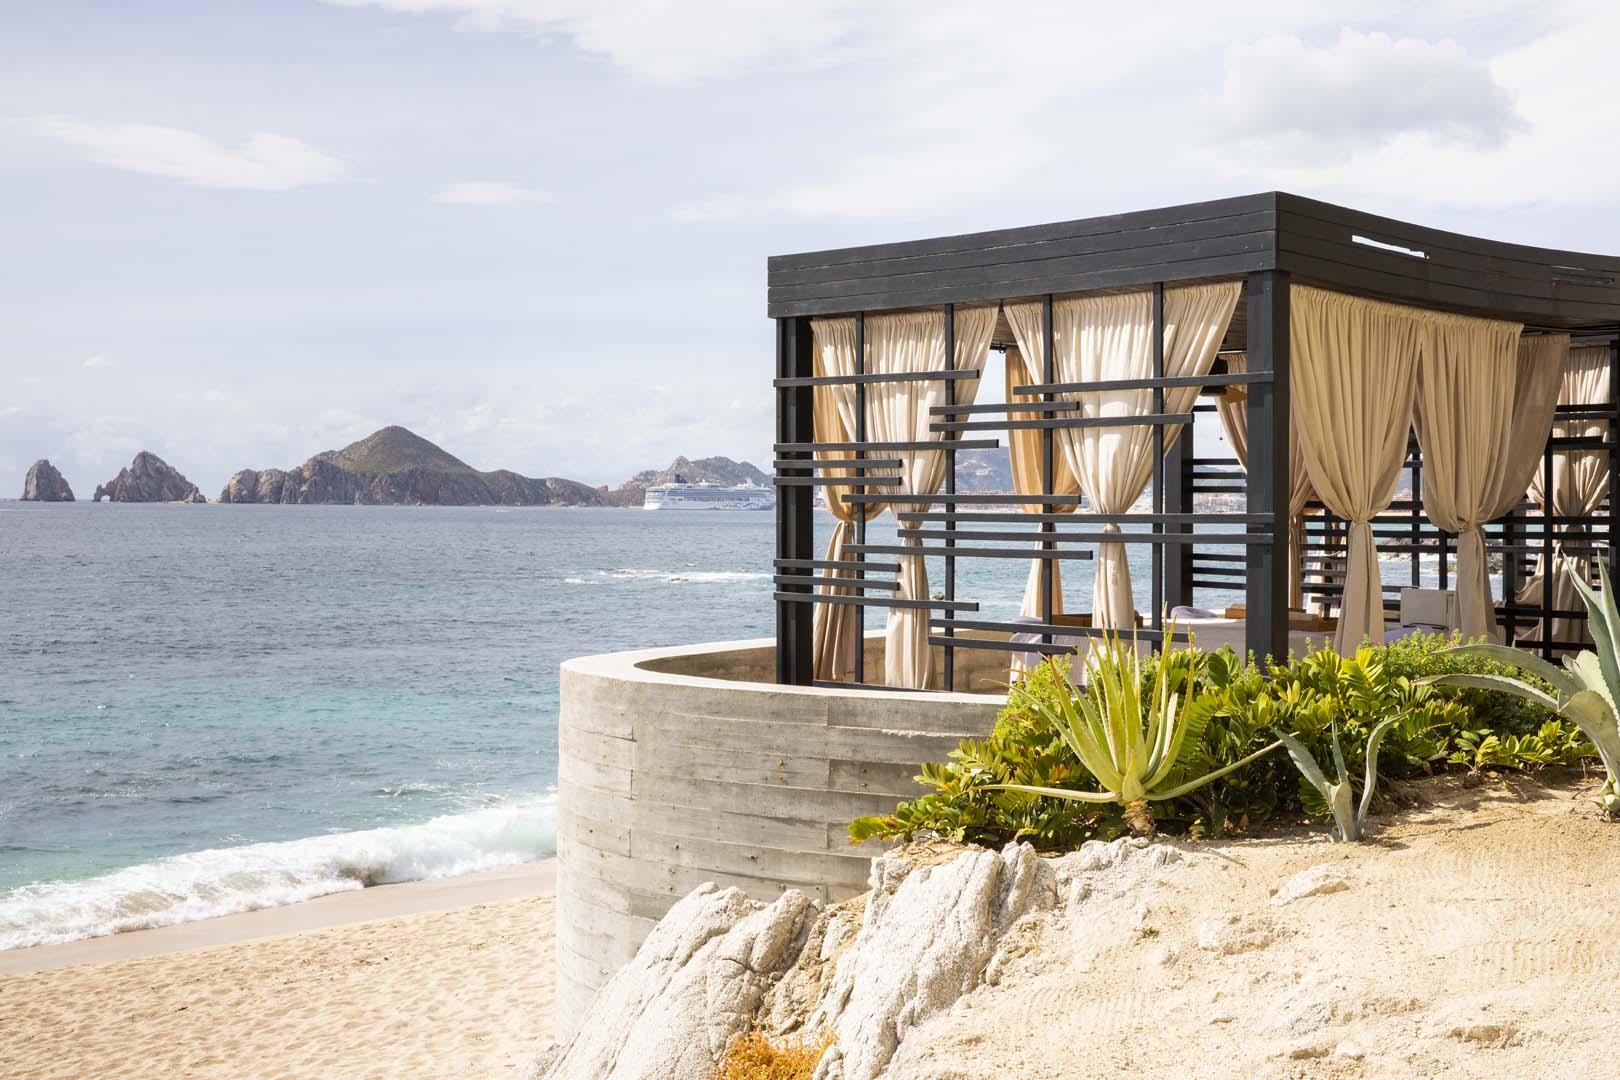 Cabo Corridor, 1 Bedroom Bedrooms, ,1 BathroomBathrooms,Condo,For Sale,The Cape, a Thompson Hotel,19-1181